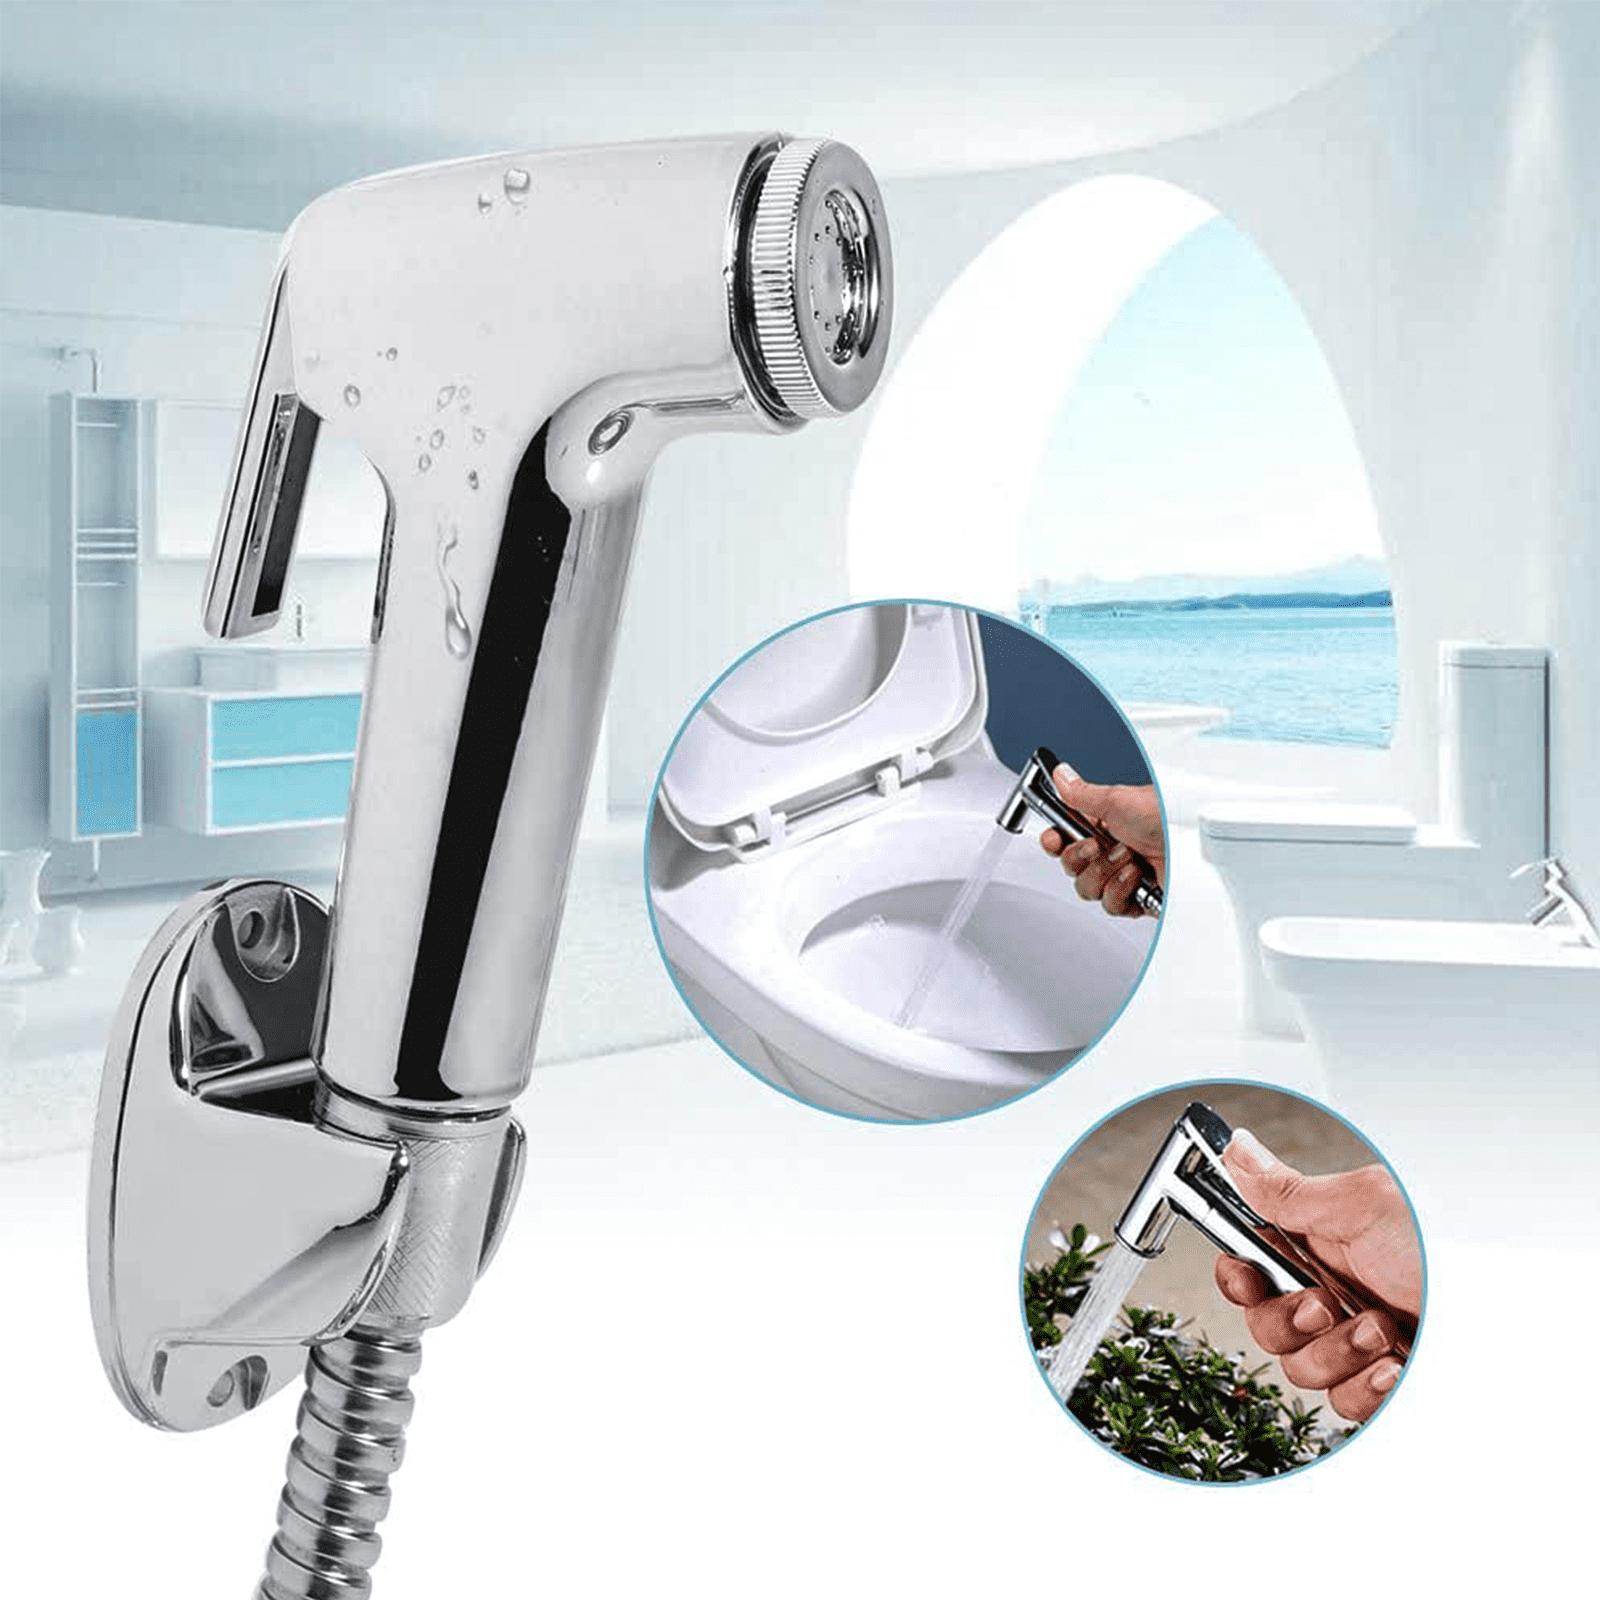 Bathroom Hand held Handheld Diaper Sprayer Shower Bidet Spray Hose Holder Toilet